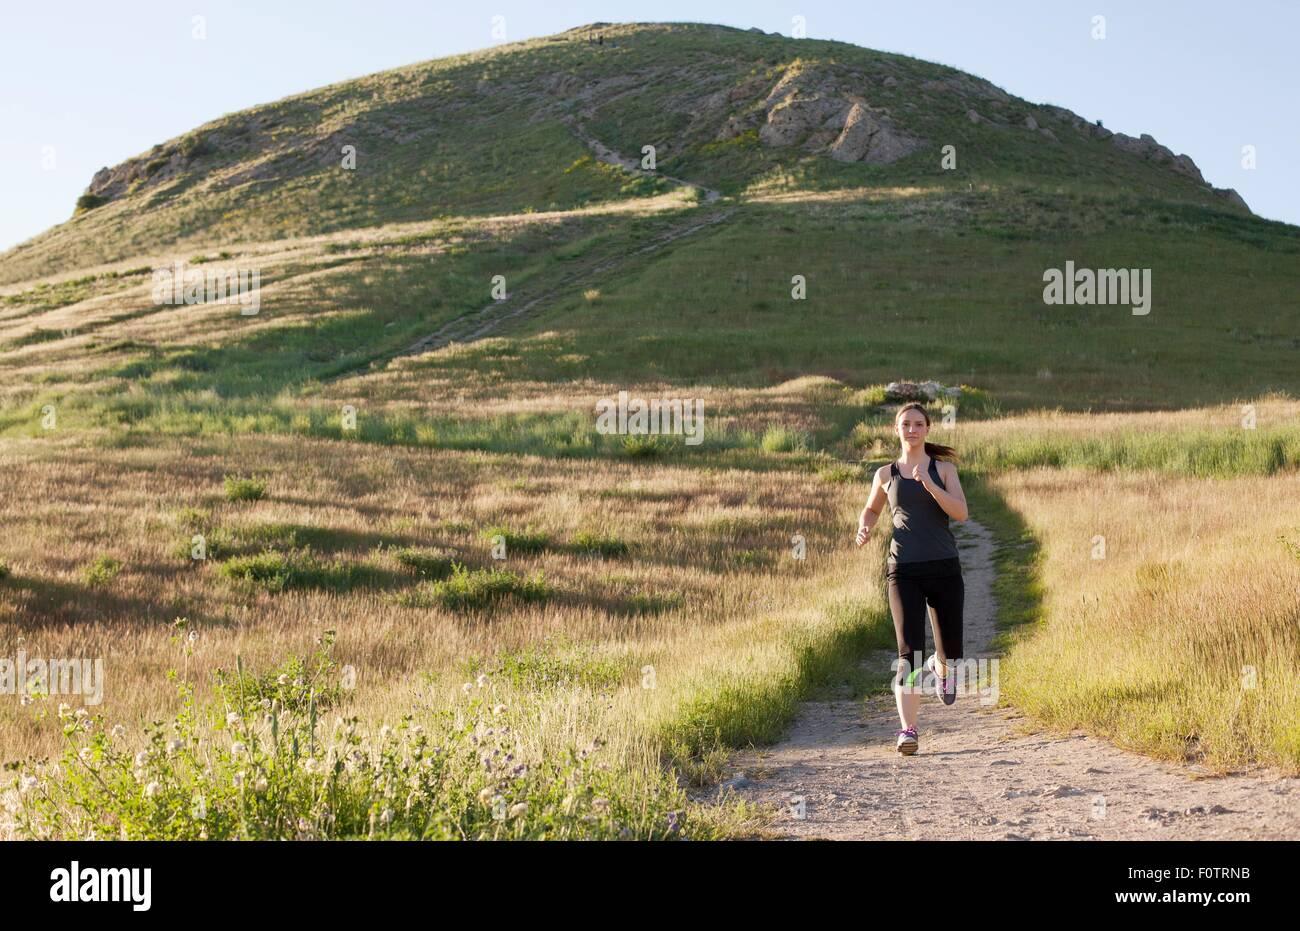 Junge Frau läuft auf Hang-Strecke Stockbild